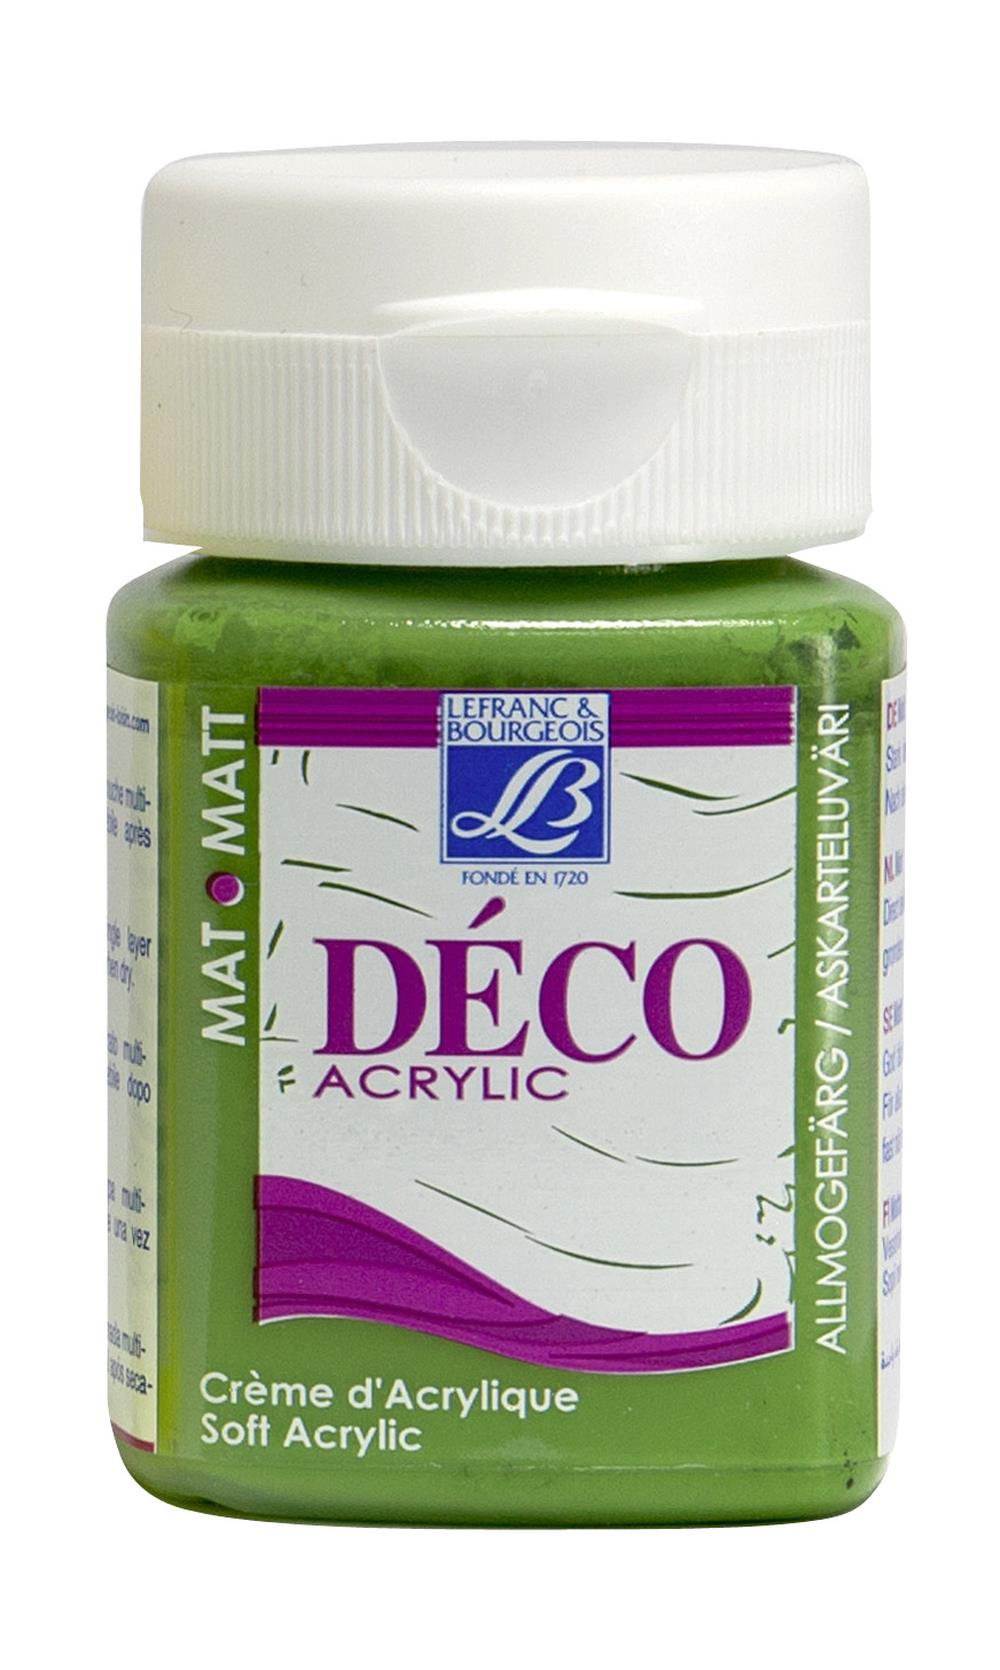 Hobbyfärg L&B Deco Matt Akryl 50ml Chlorophyll green warm 571 (4F)